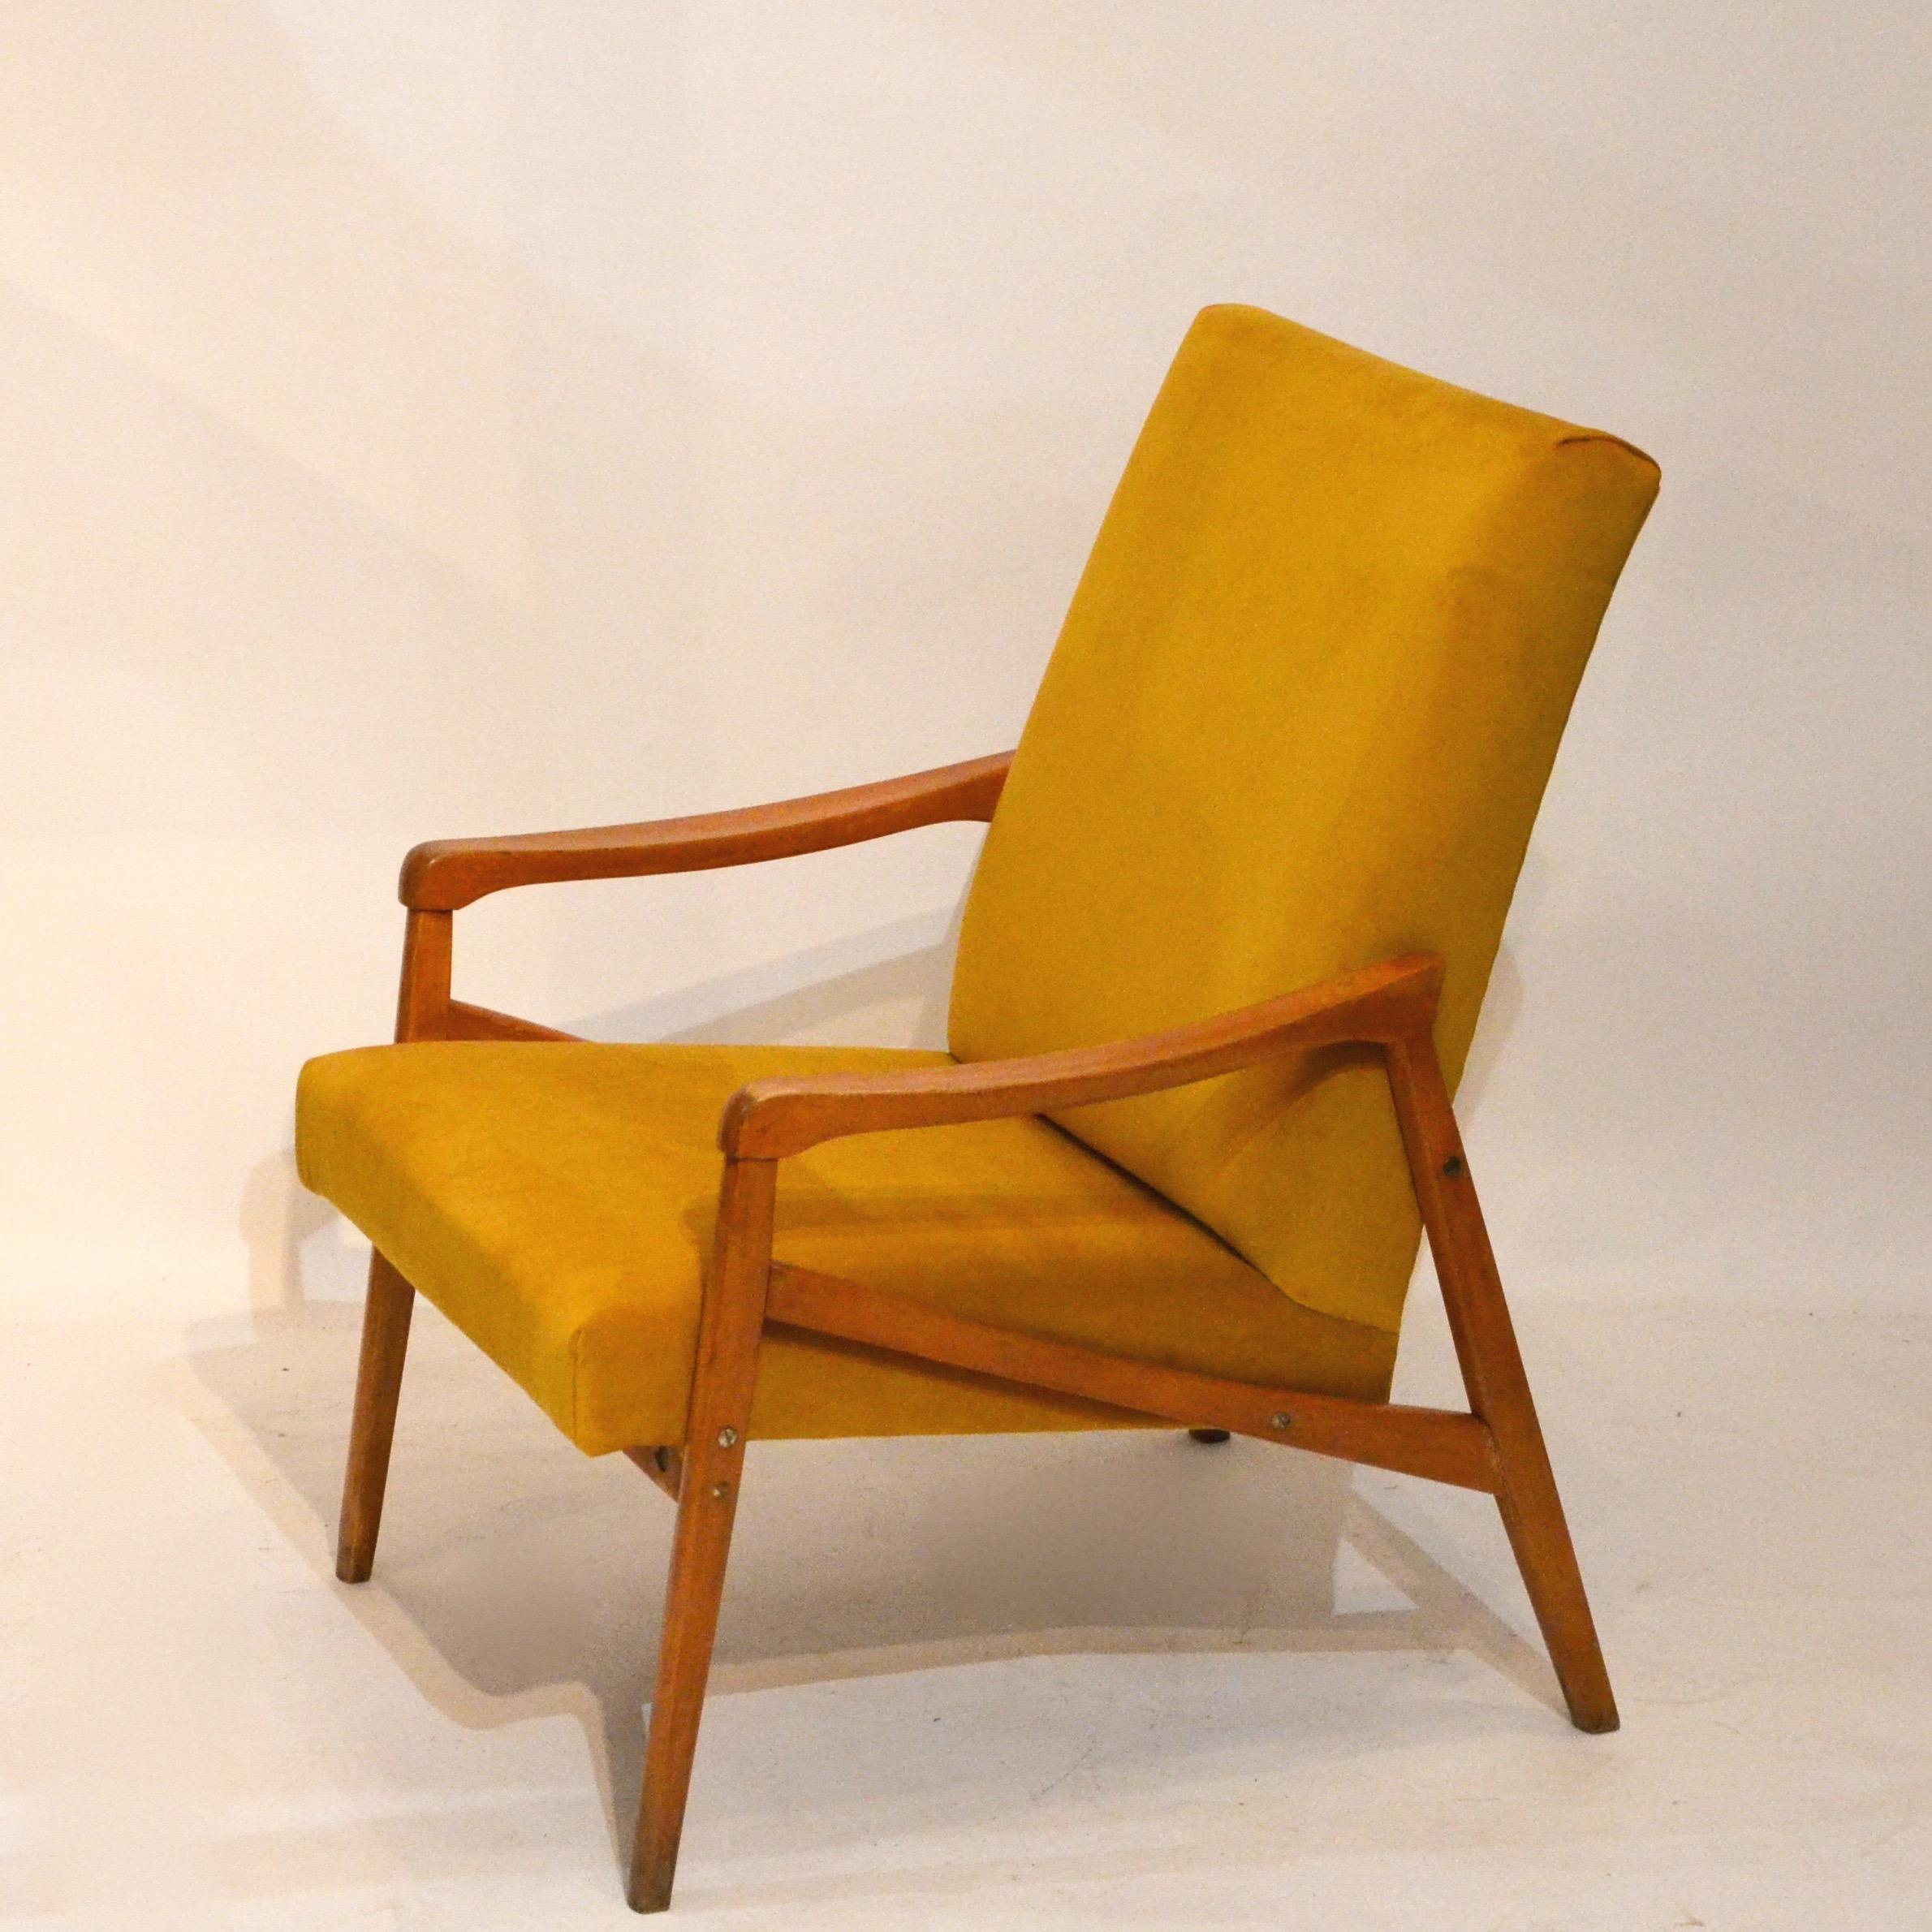 fauteuil ann es 60 moutarde 2 bindiesbindies. Black Bedroom Furniture Sets. Home Design Ideas